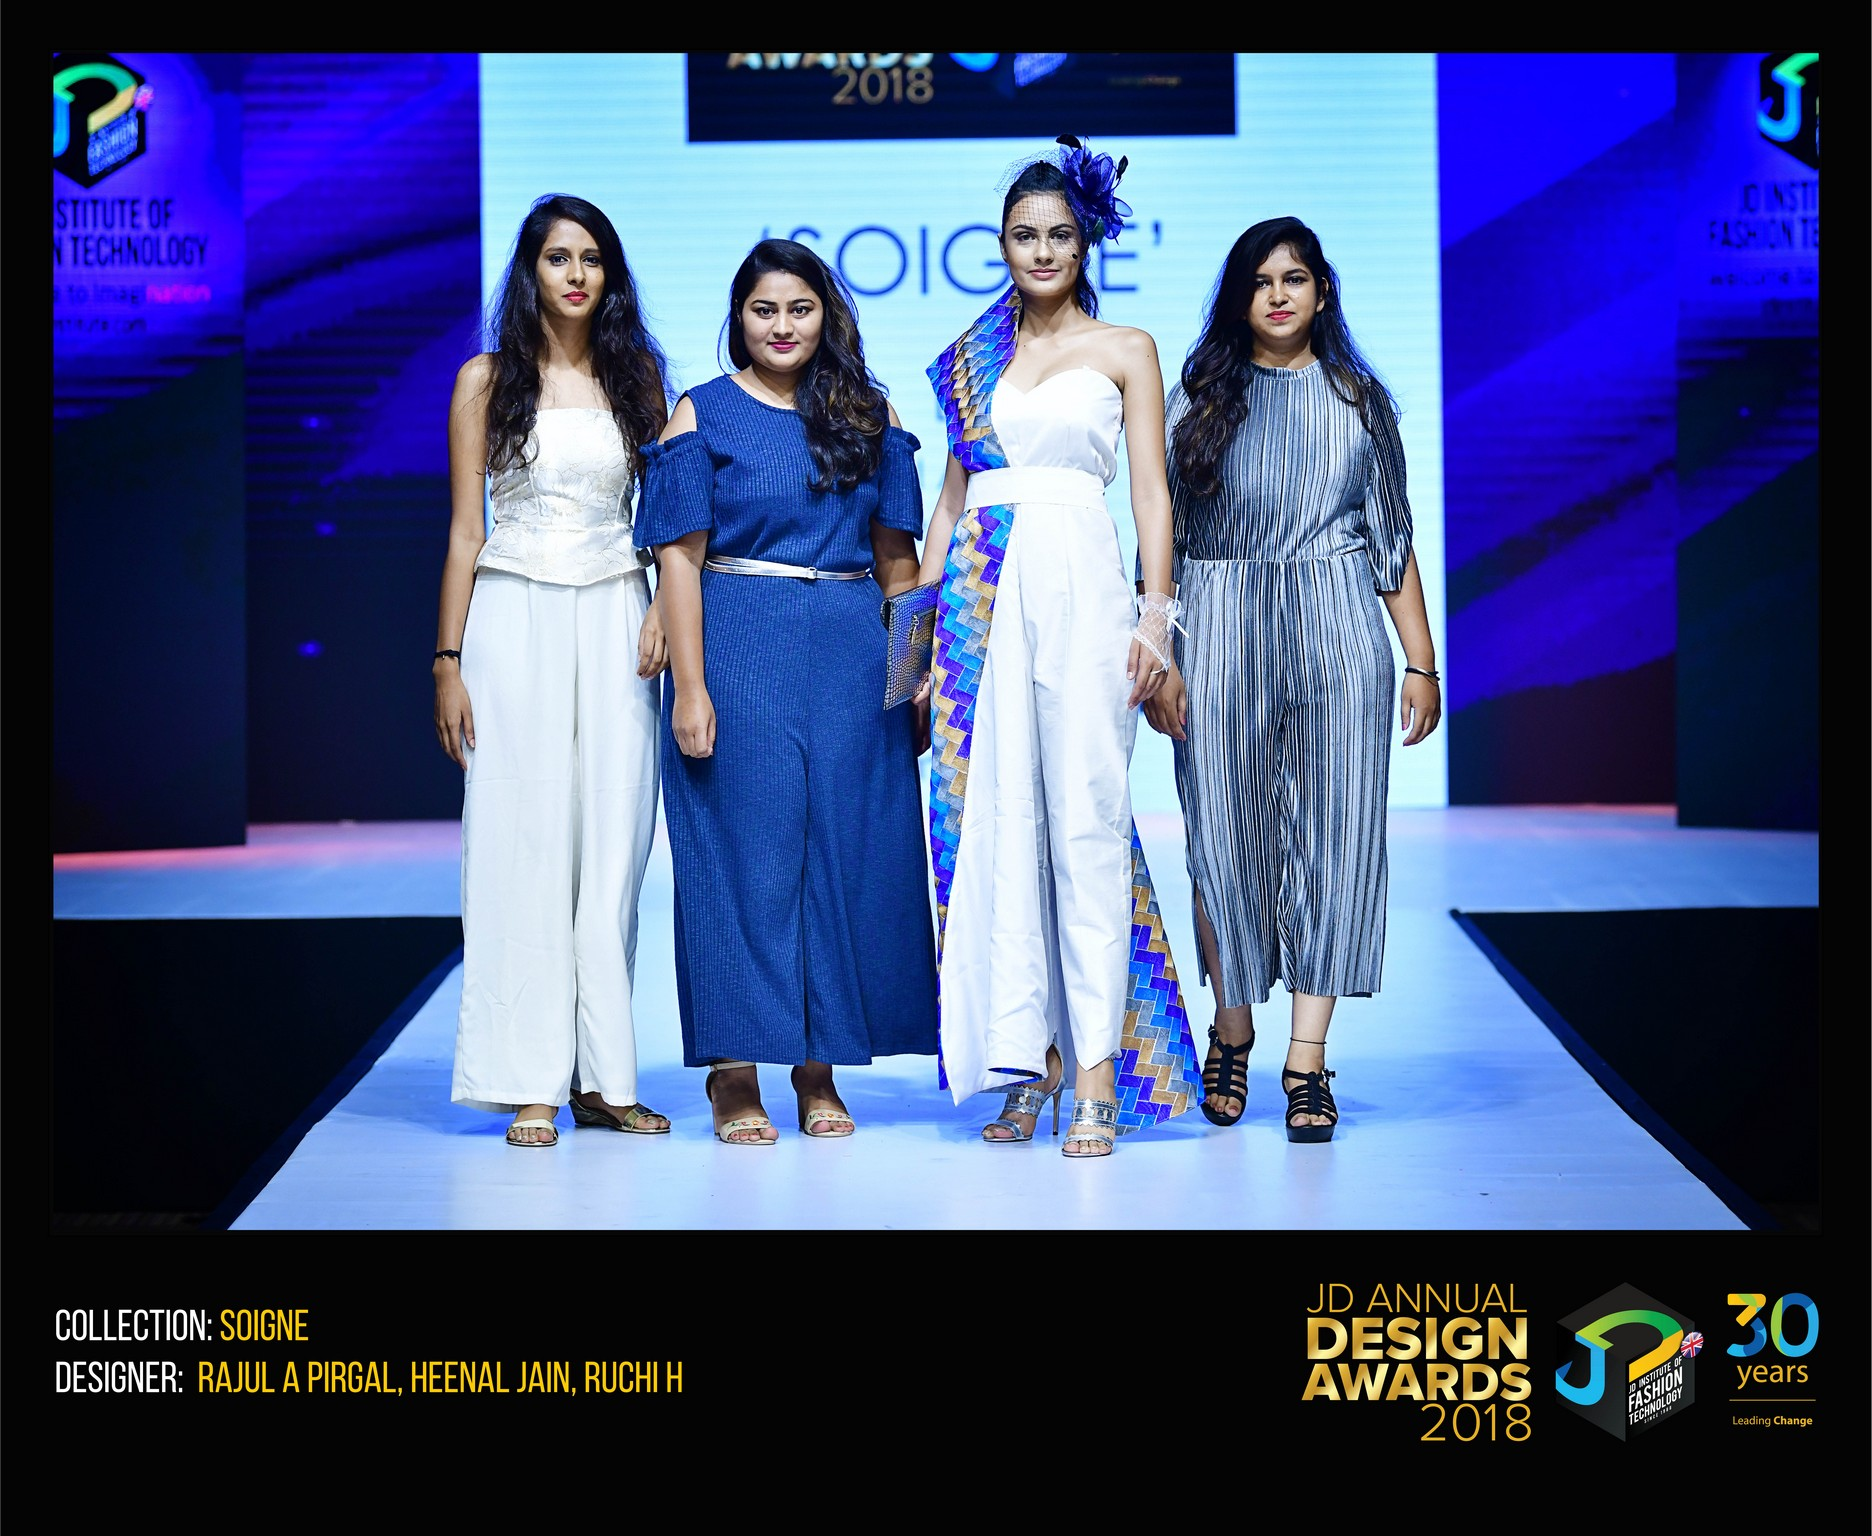 Soigne – Change – JD Annual Design Awards 2018 | Designer: Rajul, Heena and Ruchi | Photography : Jerin Nath (@jerin_nath) soigne – change – jd annual design awards 2018 Soigne – Change – JD Annual Design Awards 2018 SOIGNE 8